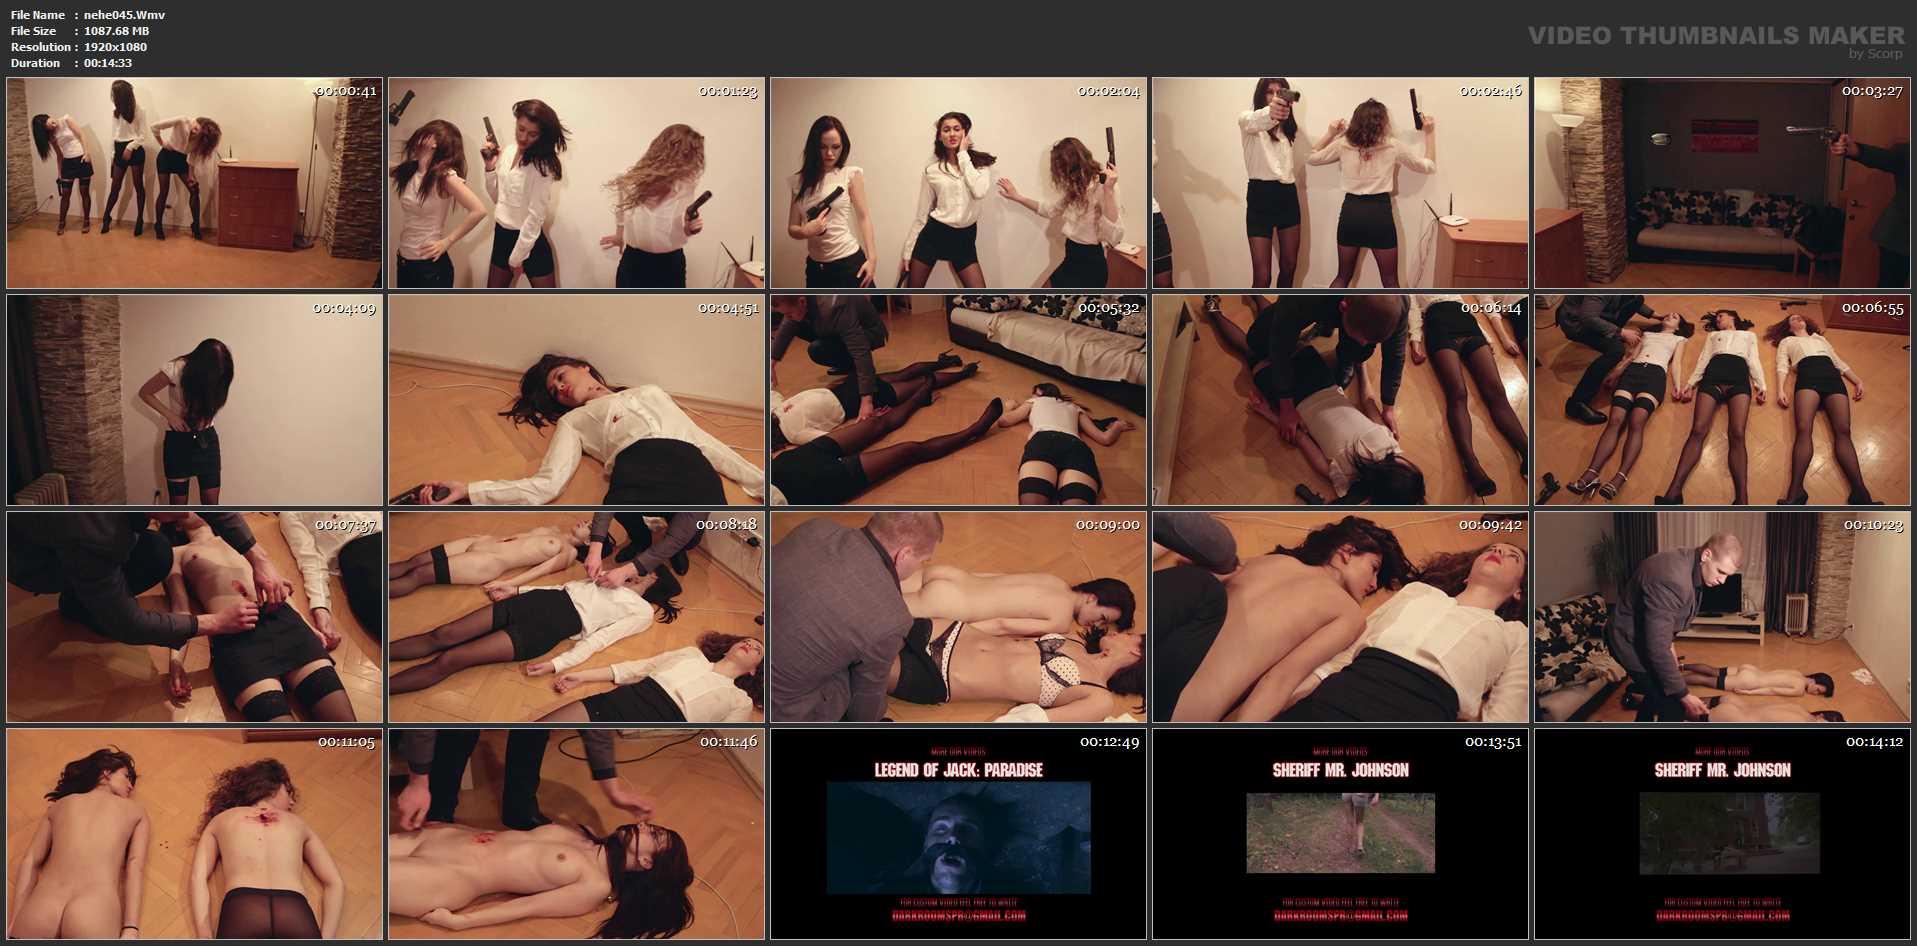 [NECROPHILIA HELL 2019] Dark Rooms - Firefight [FULL HD][1080p][WMV]